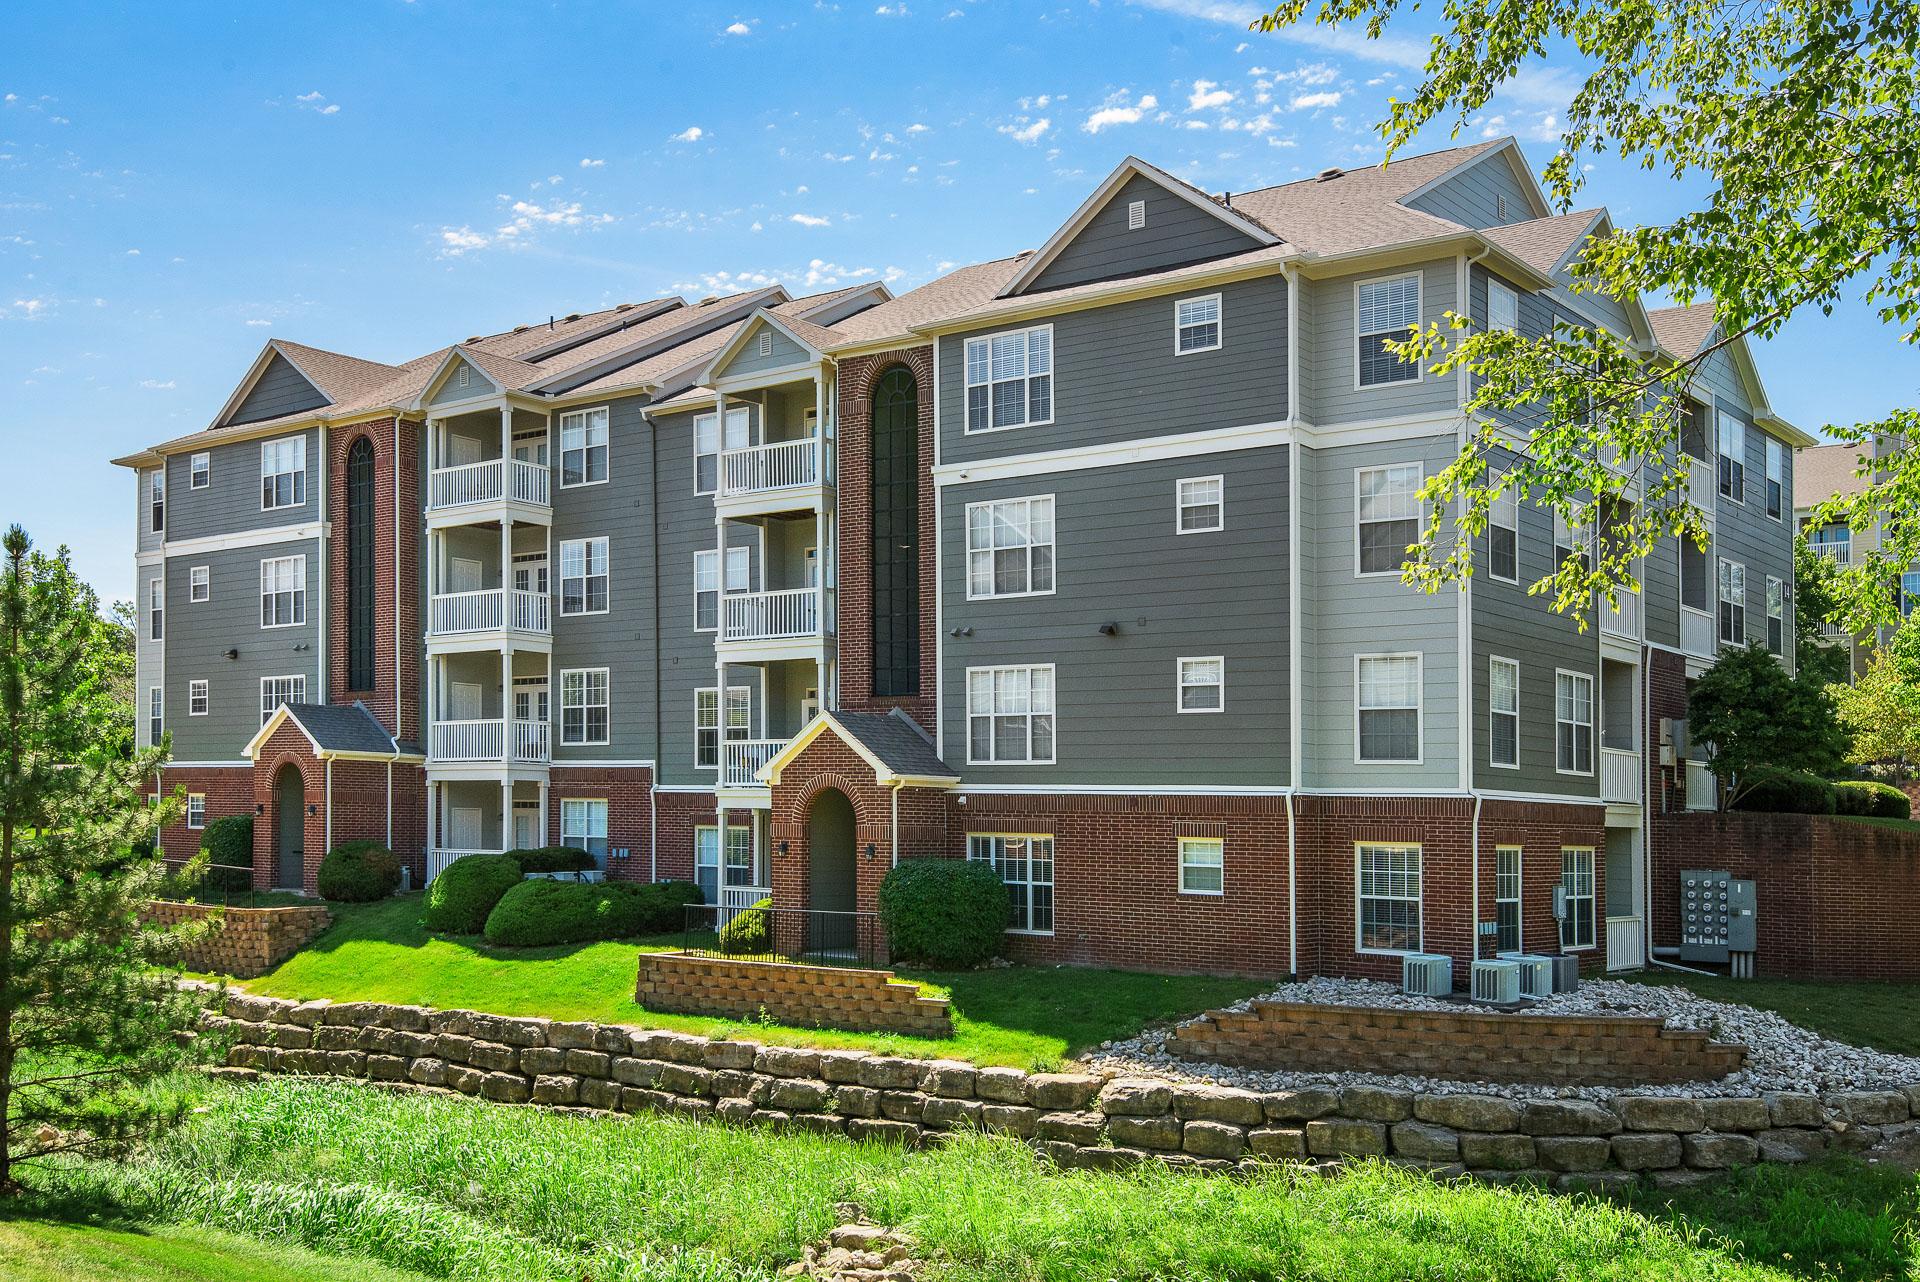 Sherpa Media Kansas City - Apartments & Multi-Family Housing - 09